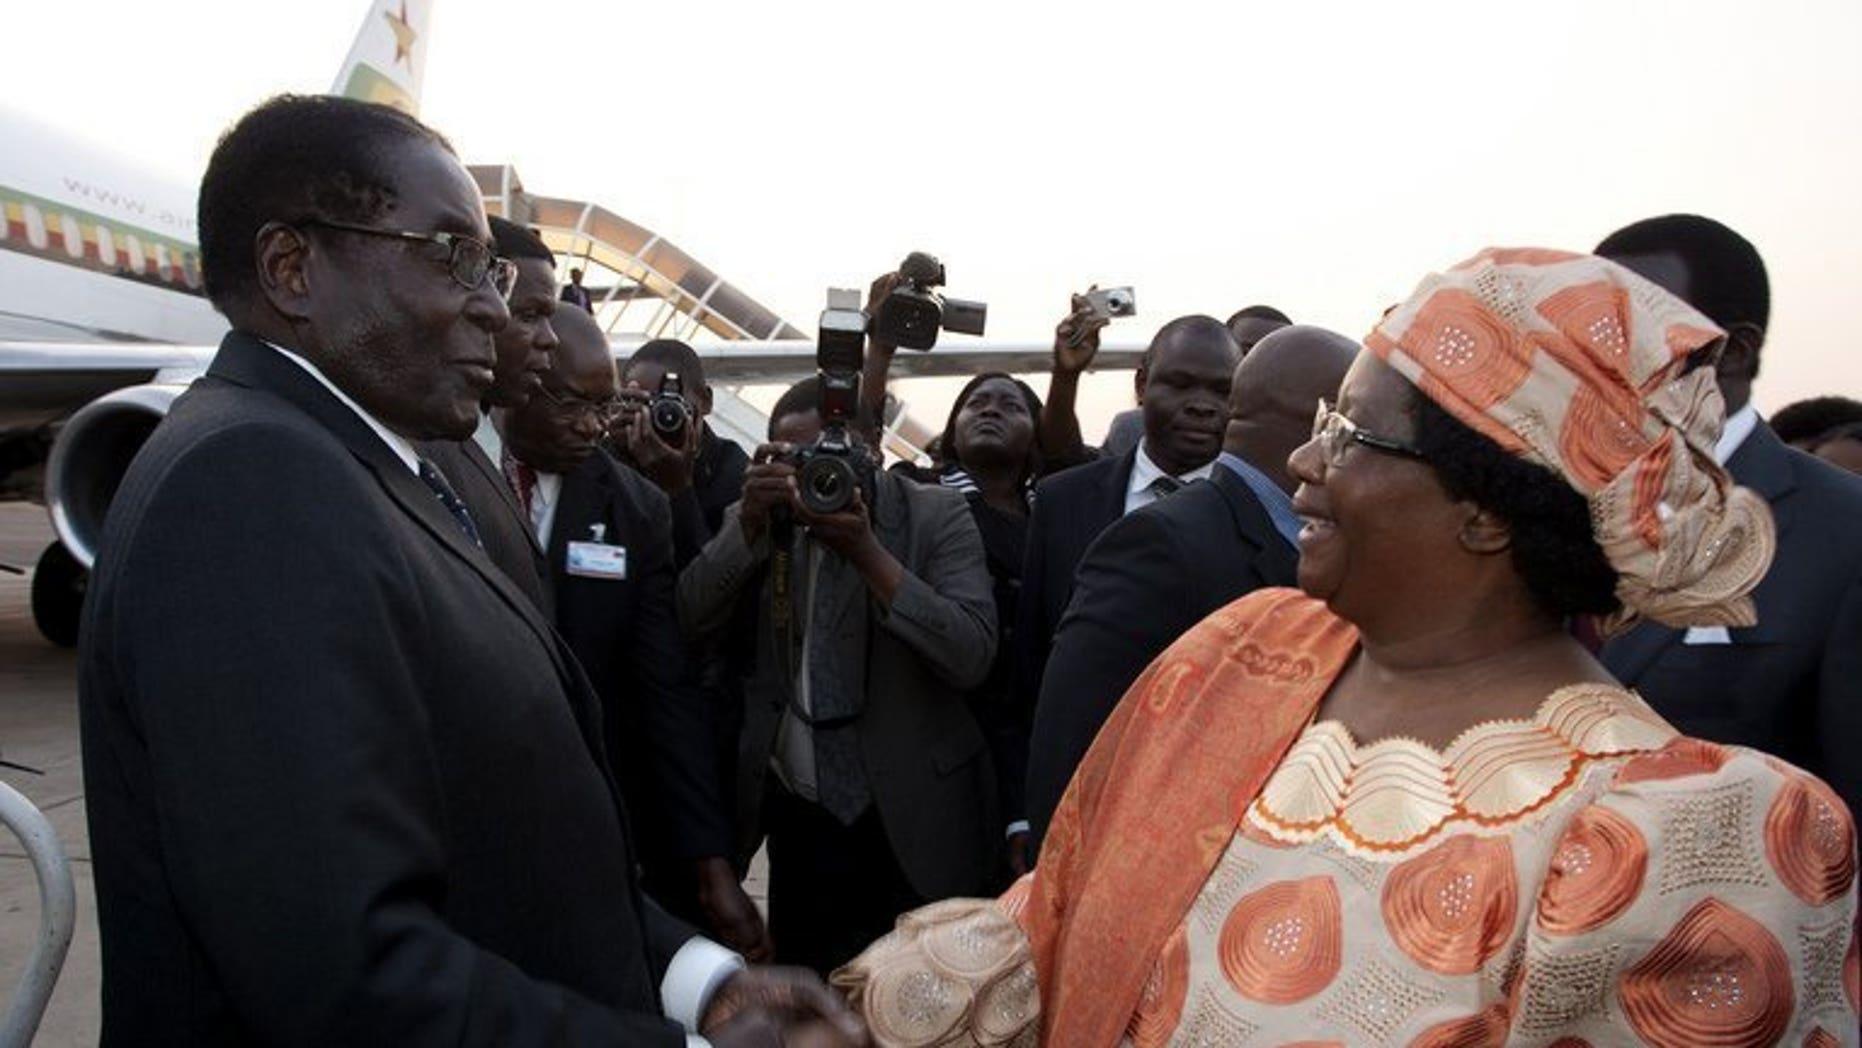 Malawi President Joyce Banda welcomes Robert Mugabe at Kamuzu Airport in Lilongwe on Friday. Mugabe will be sworn in on Thursday, beginning a fresh five-year mandate as Zimbabwe's president following a disputed election, his spokesman said Sunday